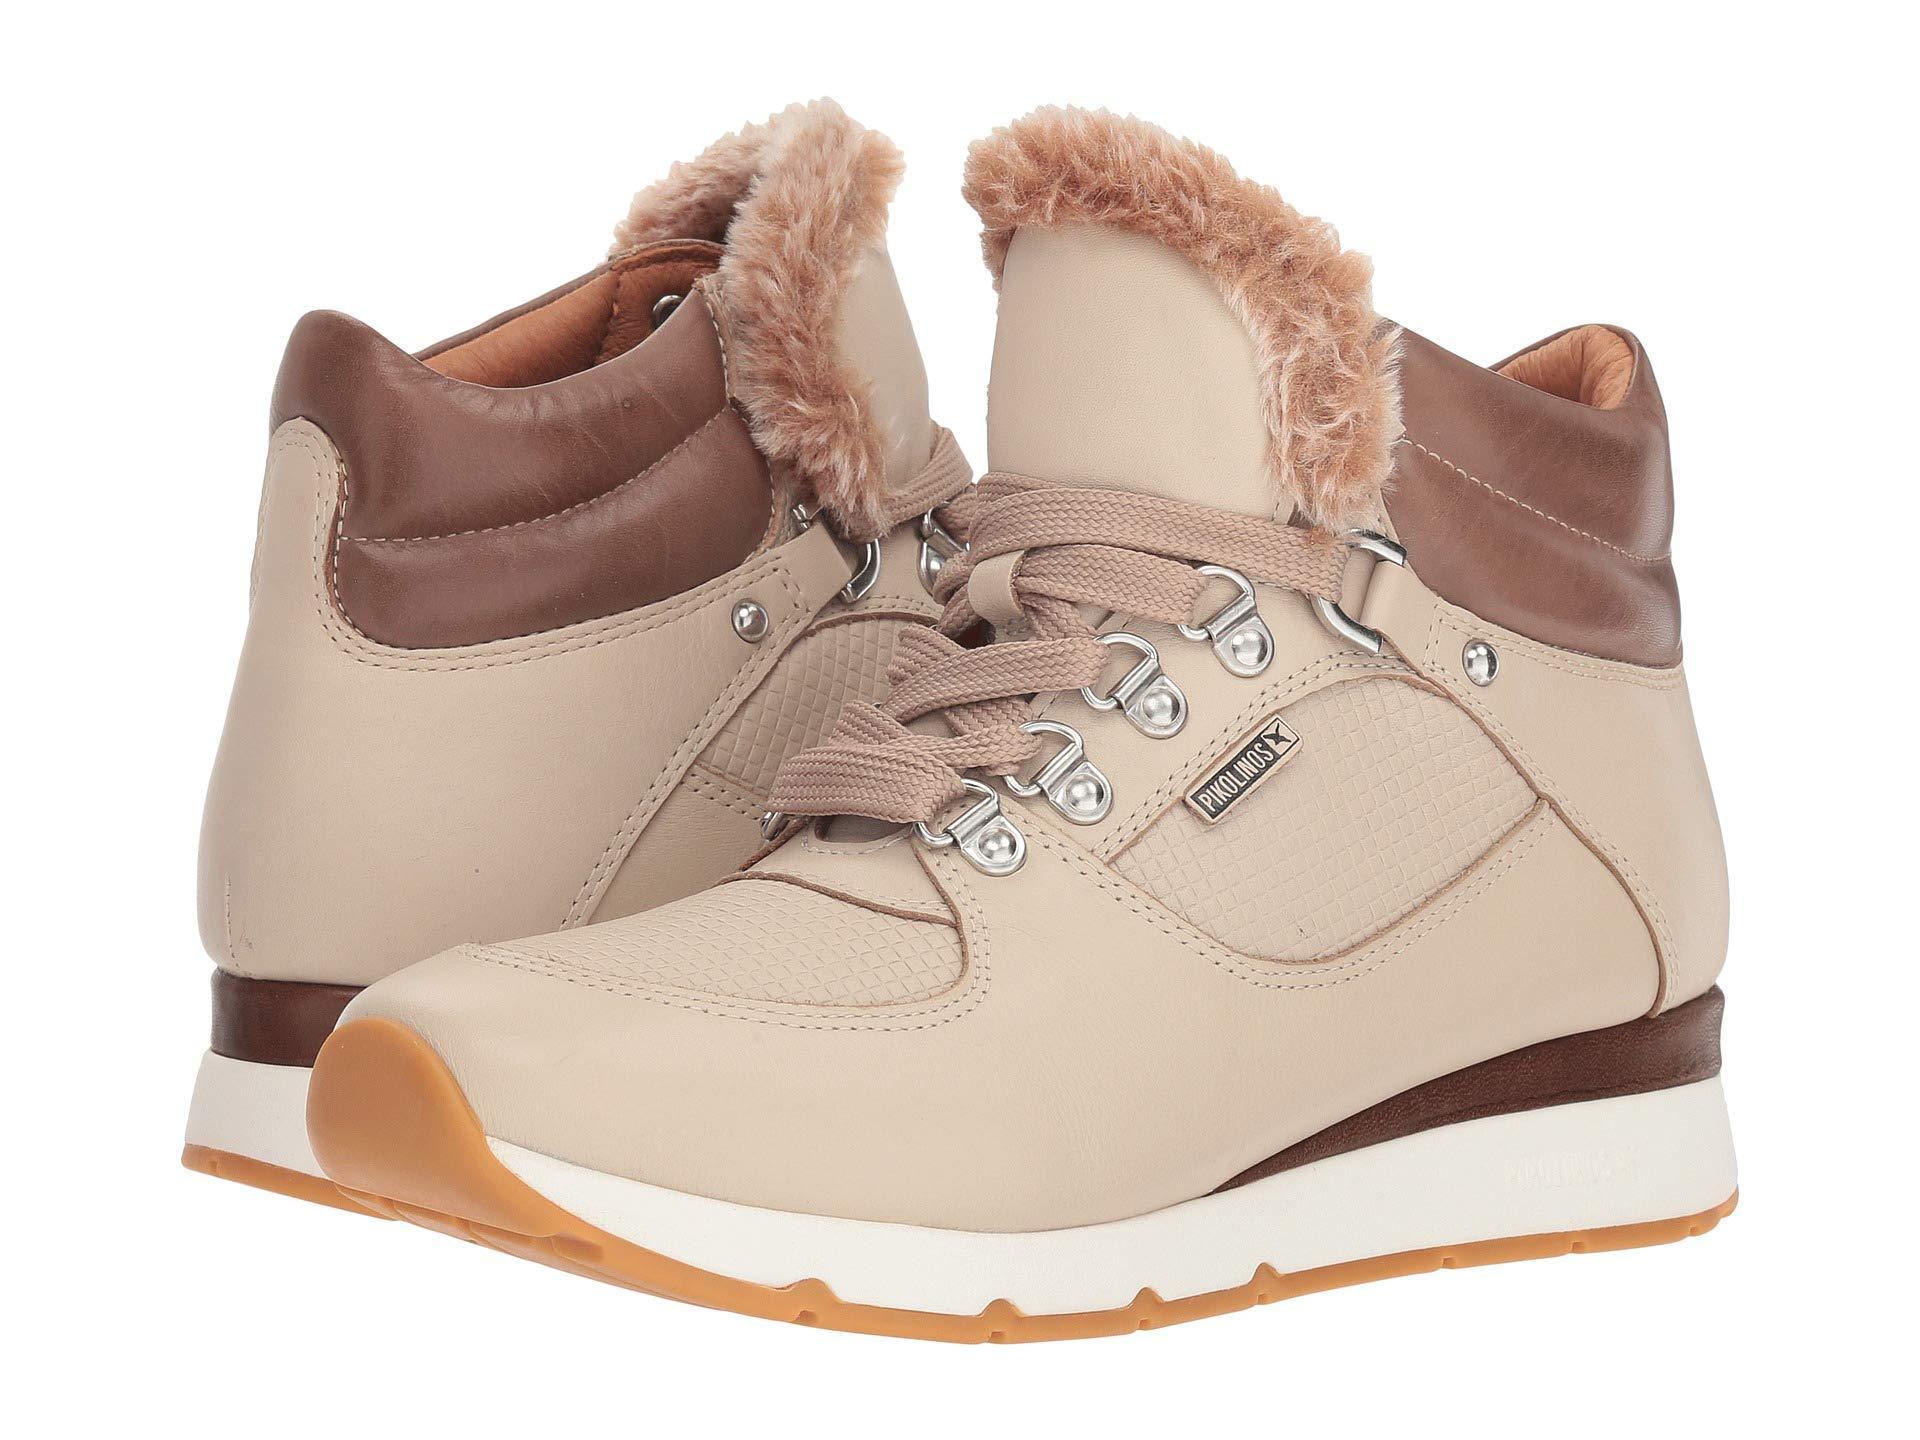 7a4922db8f9 Lyst - Pikolinos Mundaka W0j-6752c1 (marfil Siena) Women s Shoes